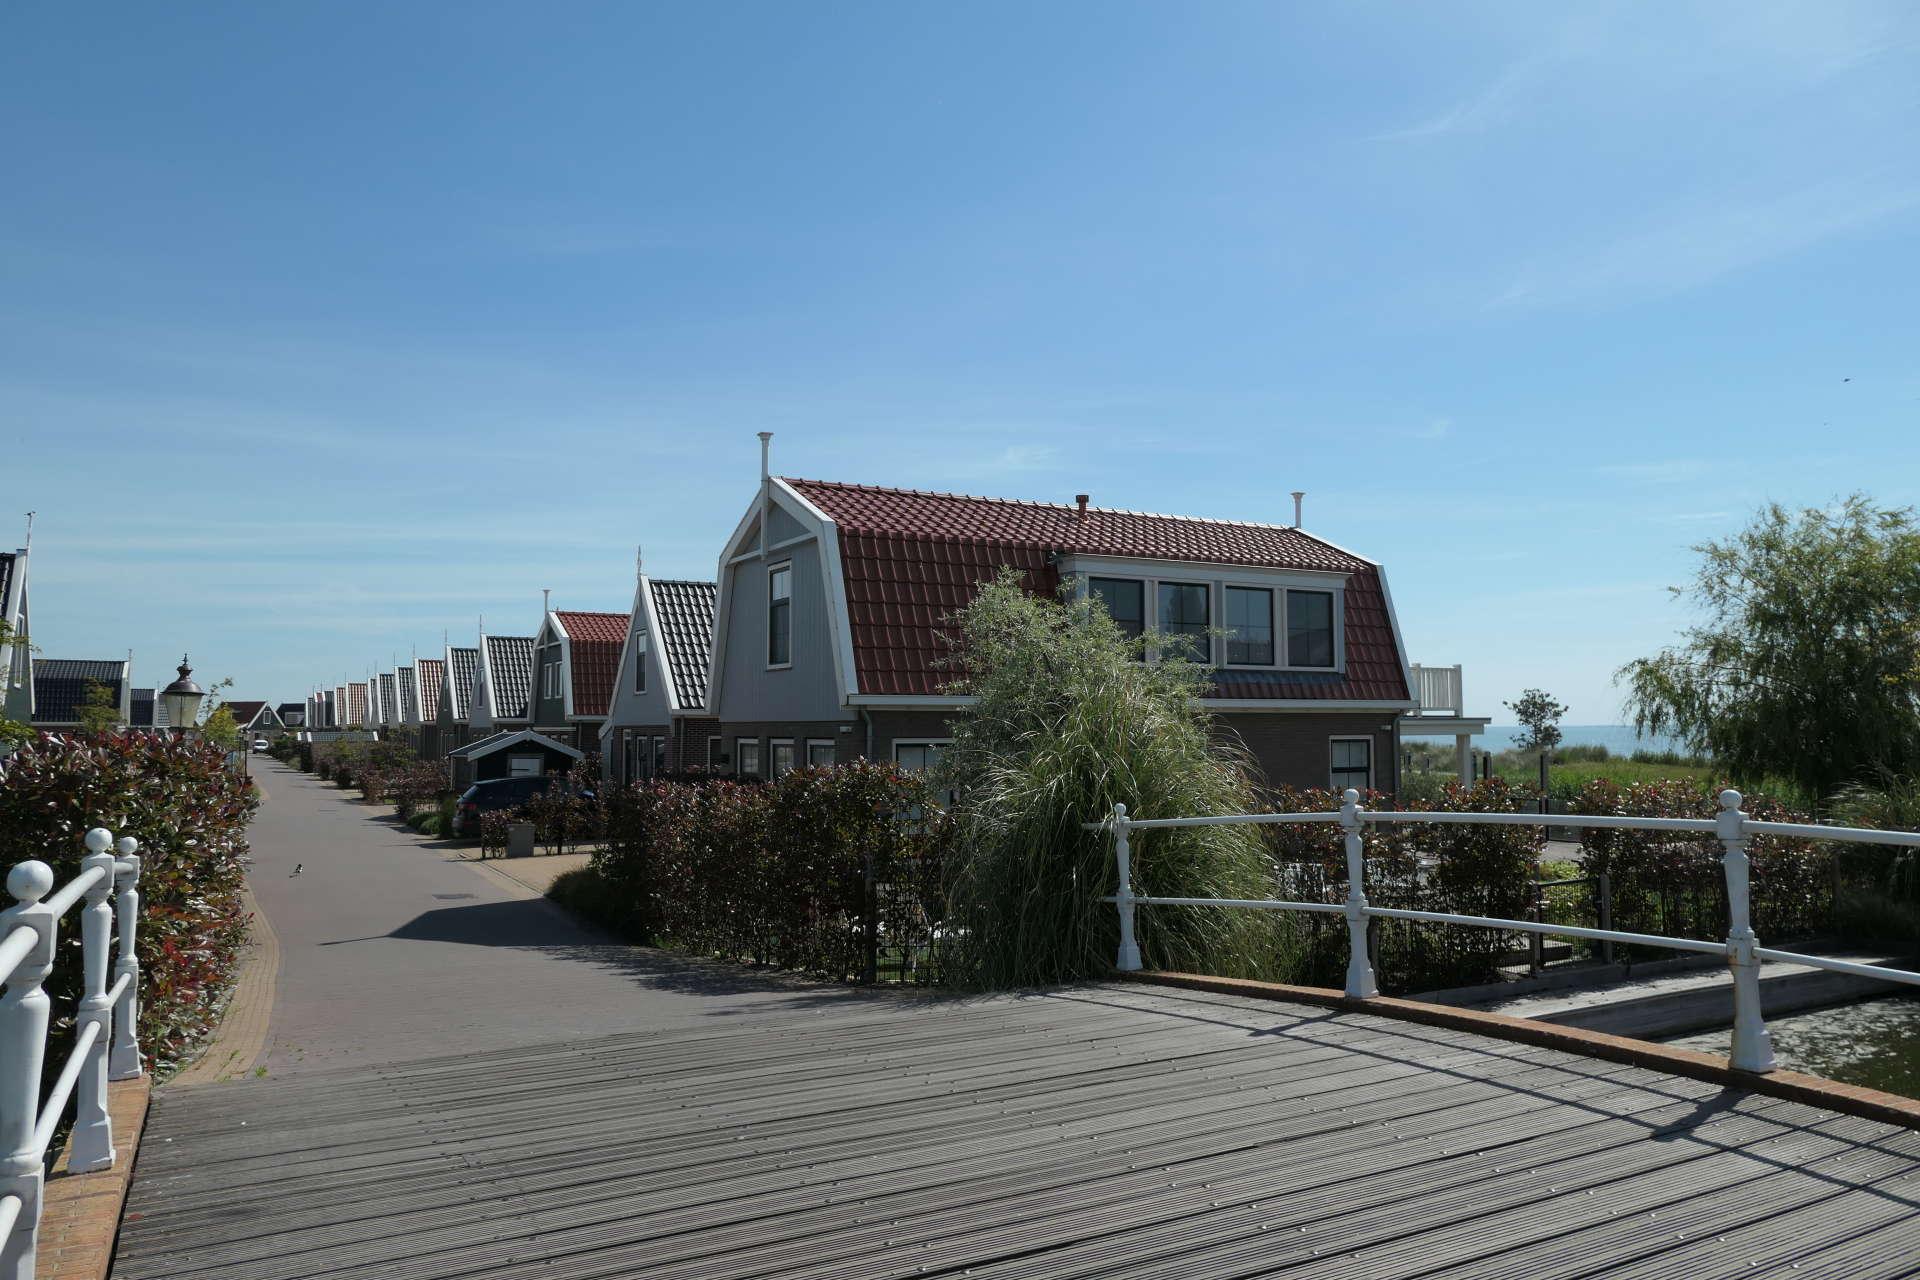 accommodations-park-europarcs-poort-van-amsterdam